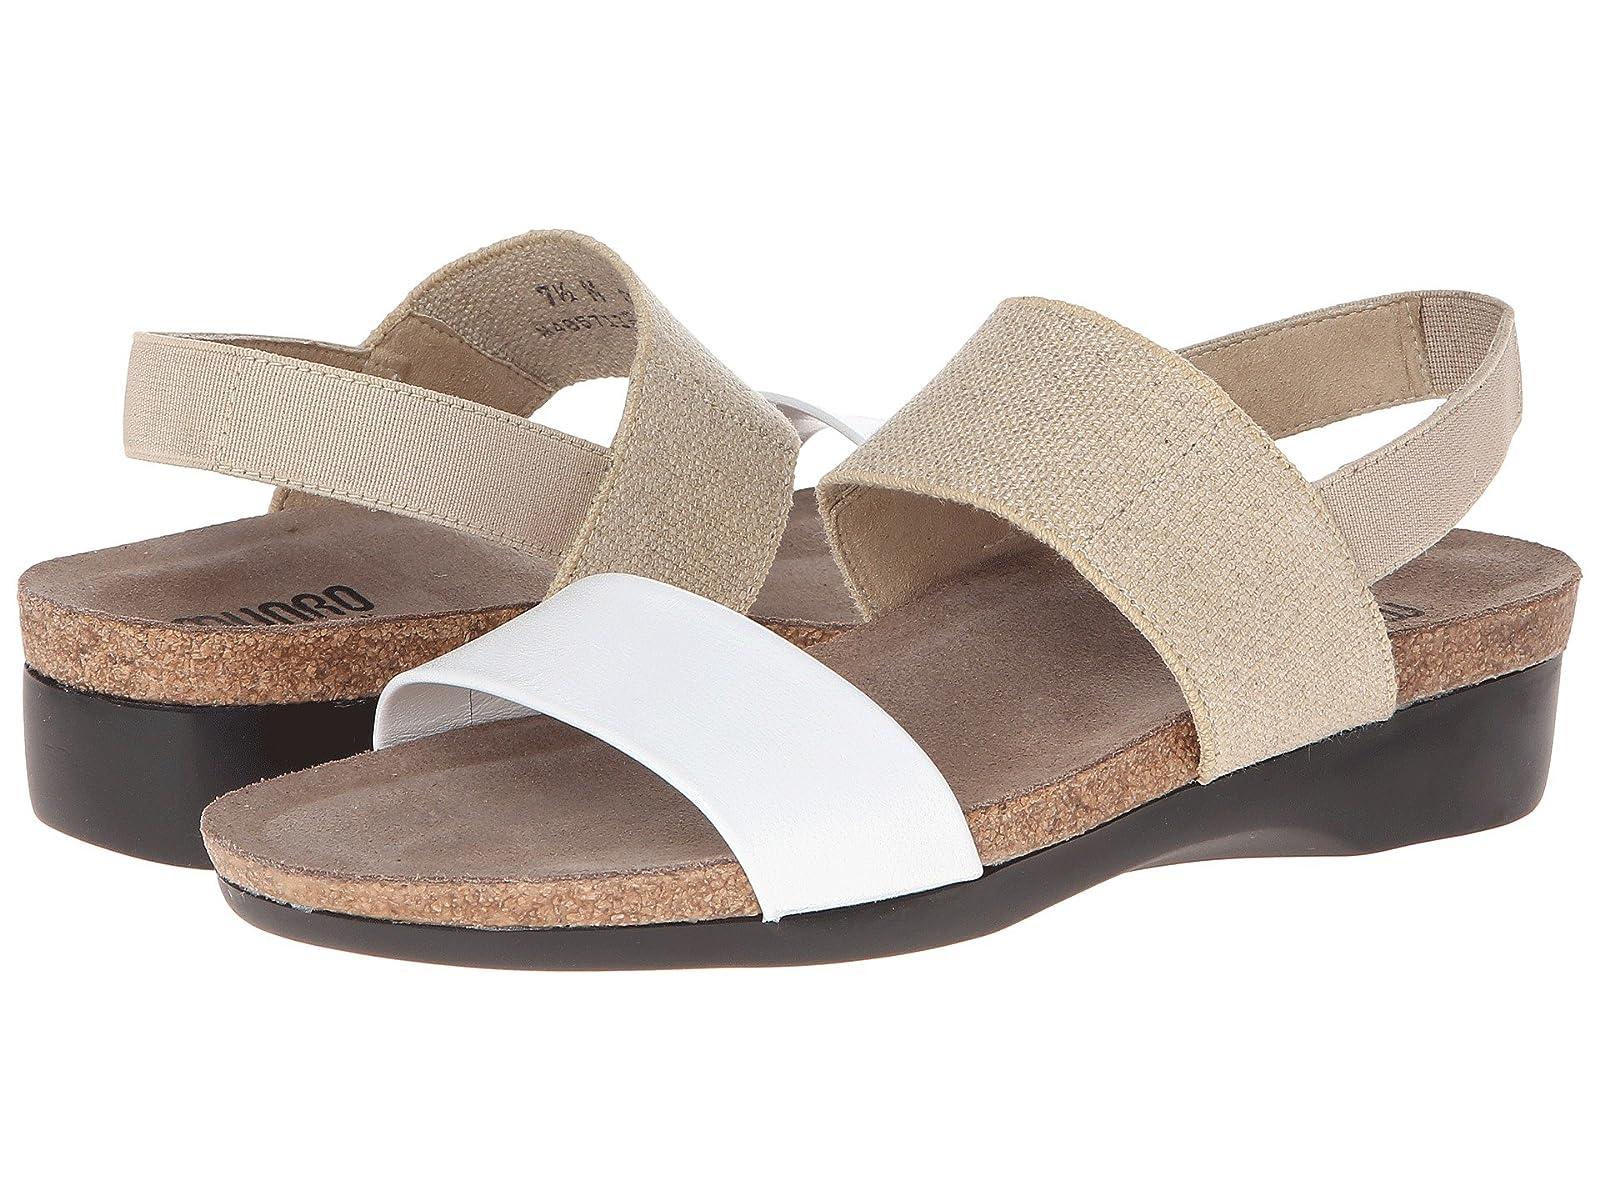 Munro PiscesCheap and distinctive eye-catching shoes